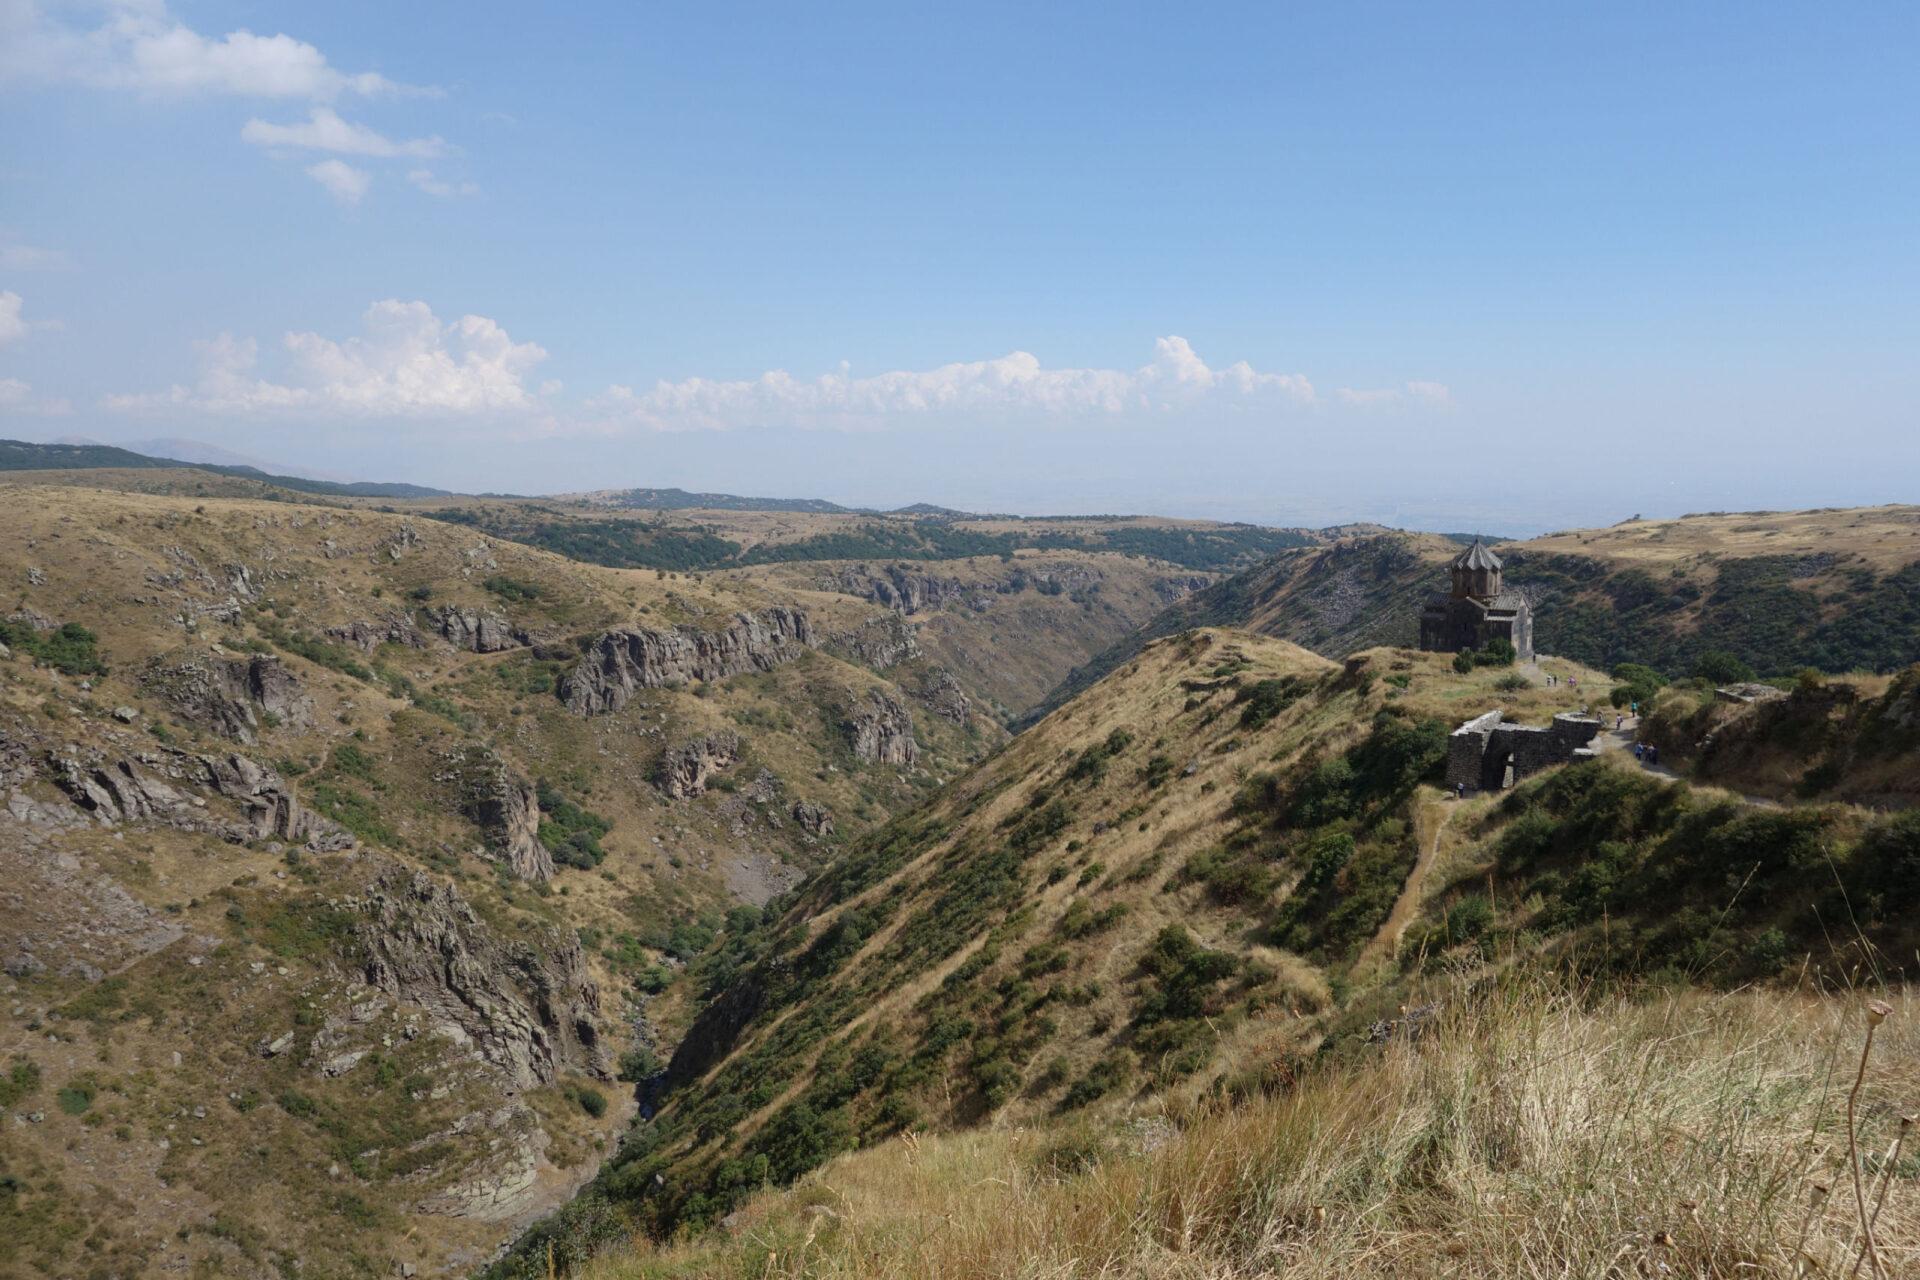 Армения. Часть 2. Крепость Амберд, собор Аруч икараван-сарай